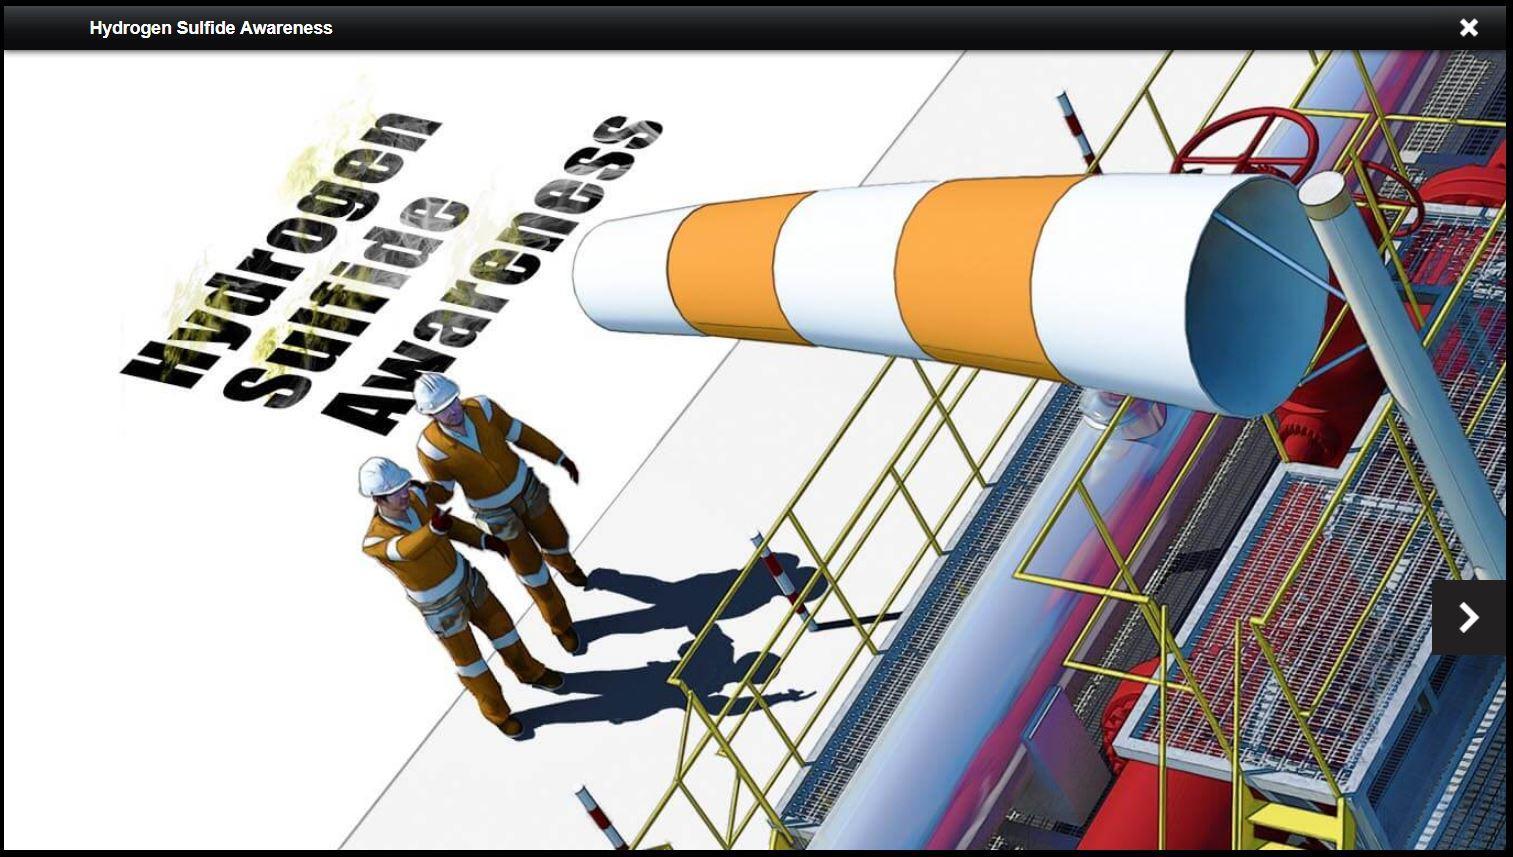 Hydrogen Sulfide Awareness Training 2